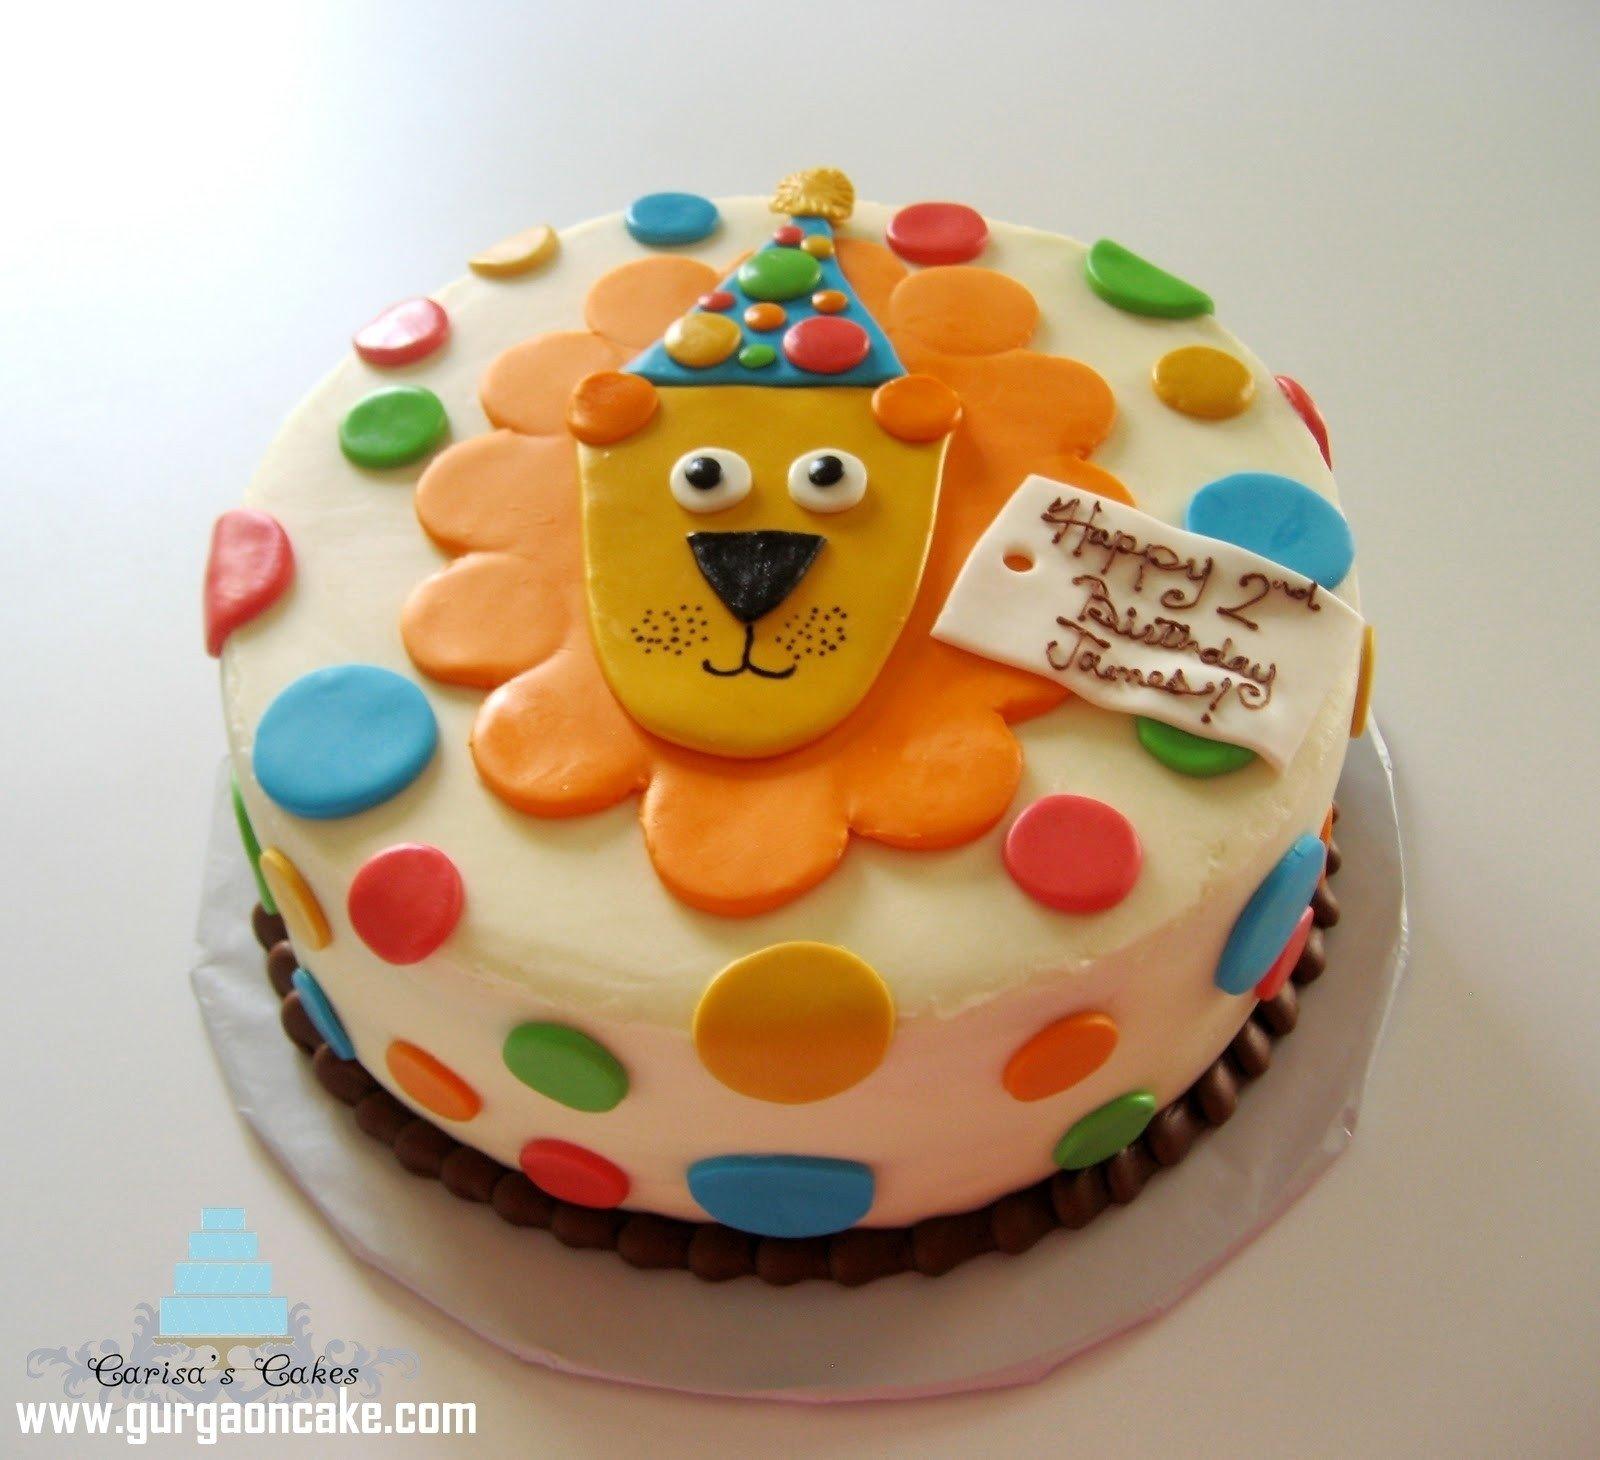 10 Amazing 2 Year Old Birthday Cake Ideas birthday cake for ba boy 2 year with birthday cake ideas two year